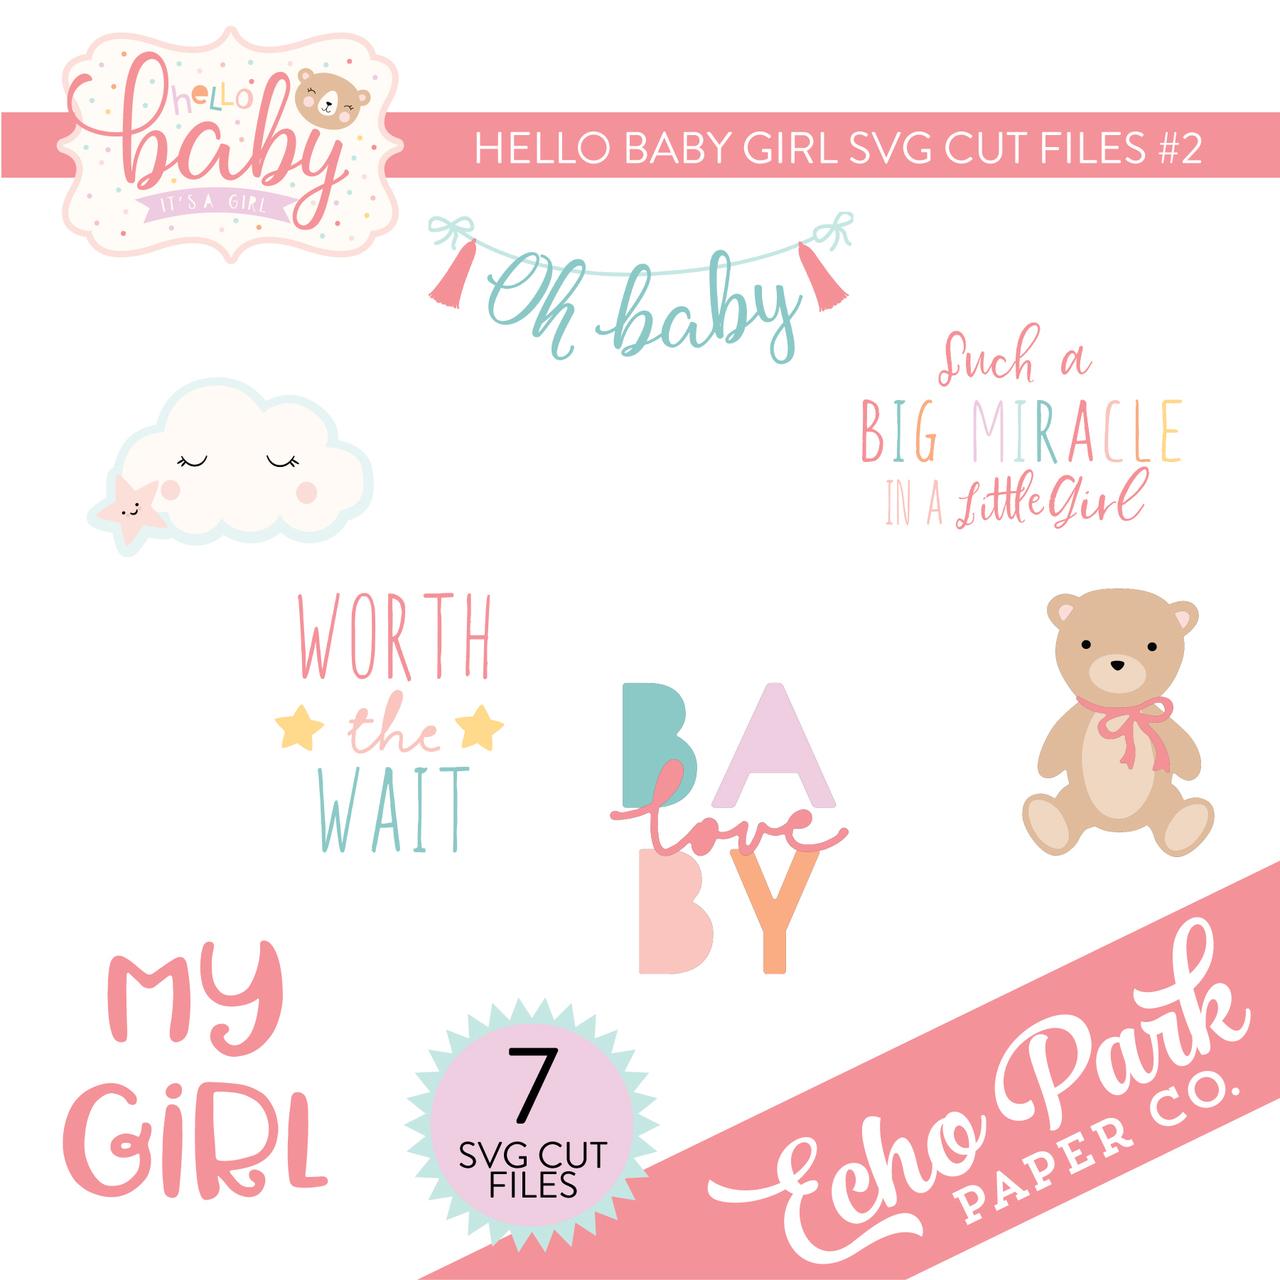 Hello Baby Girl SVG Cut Files #2